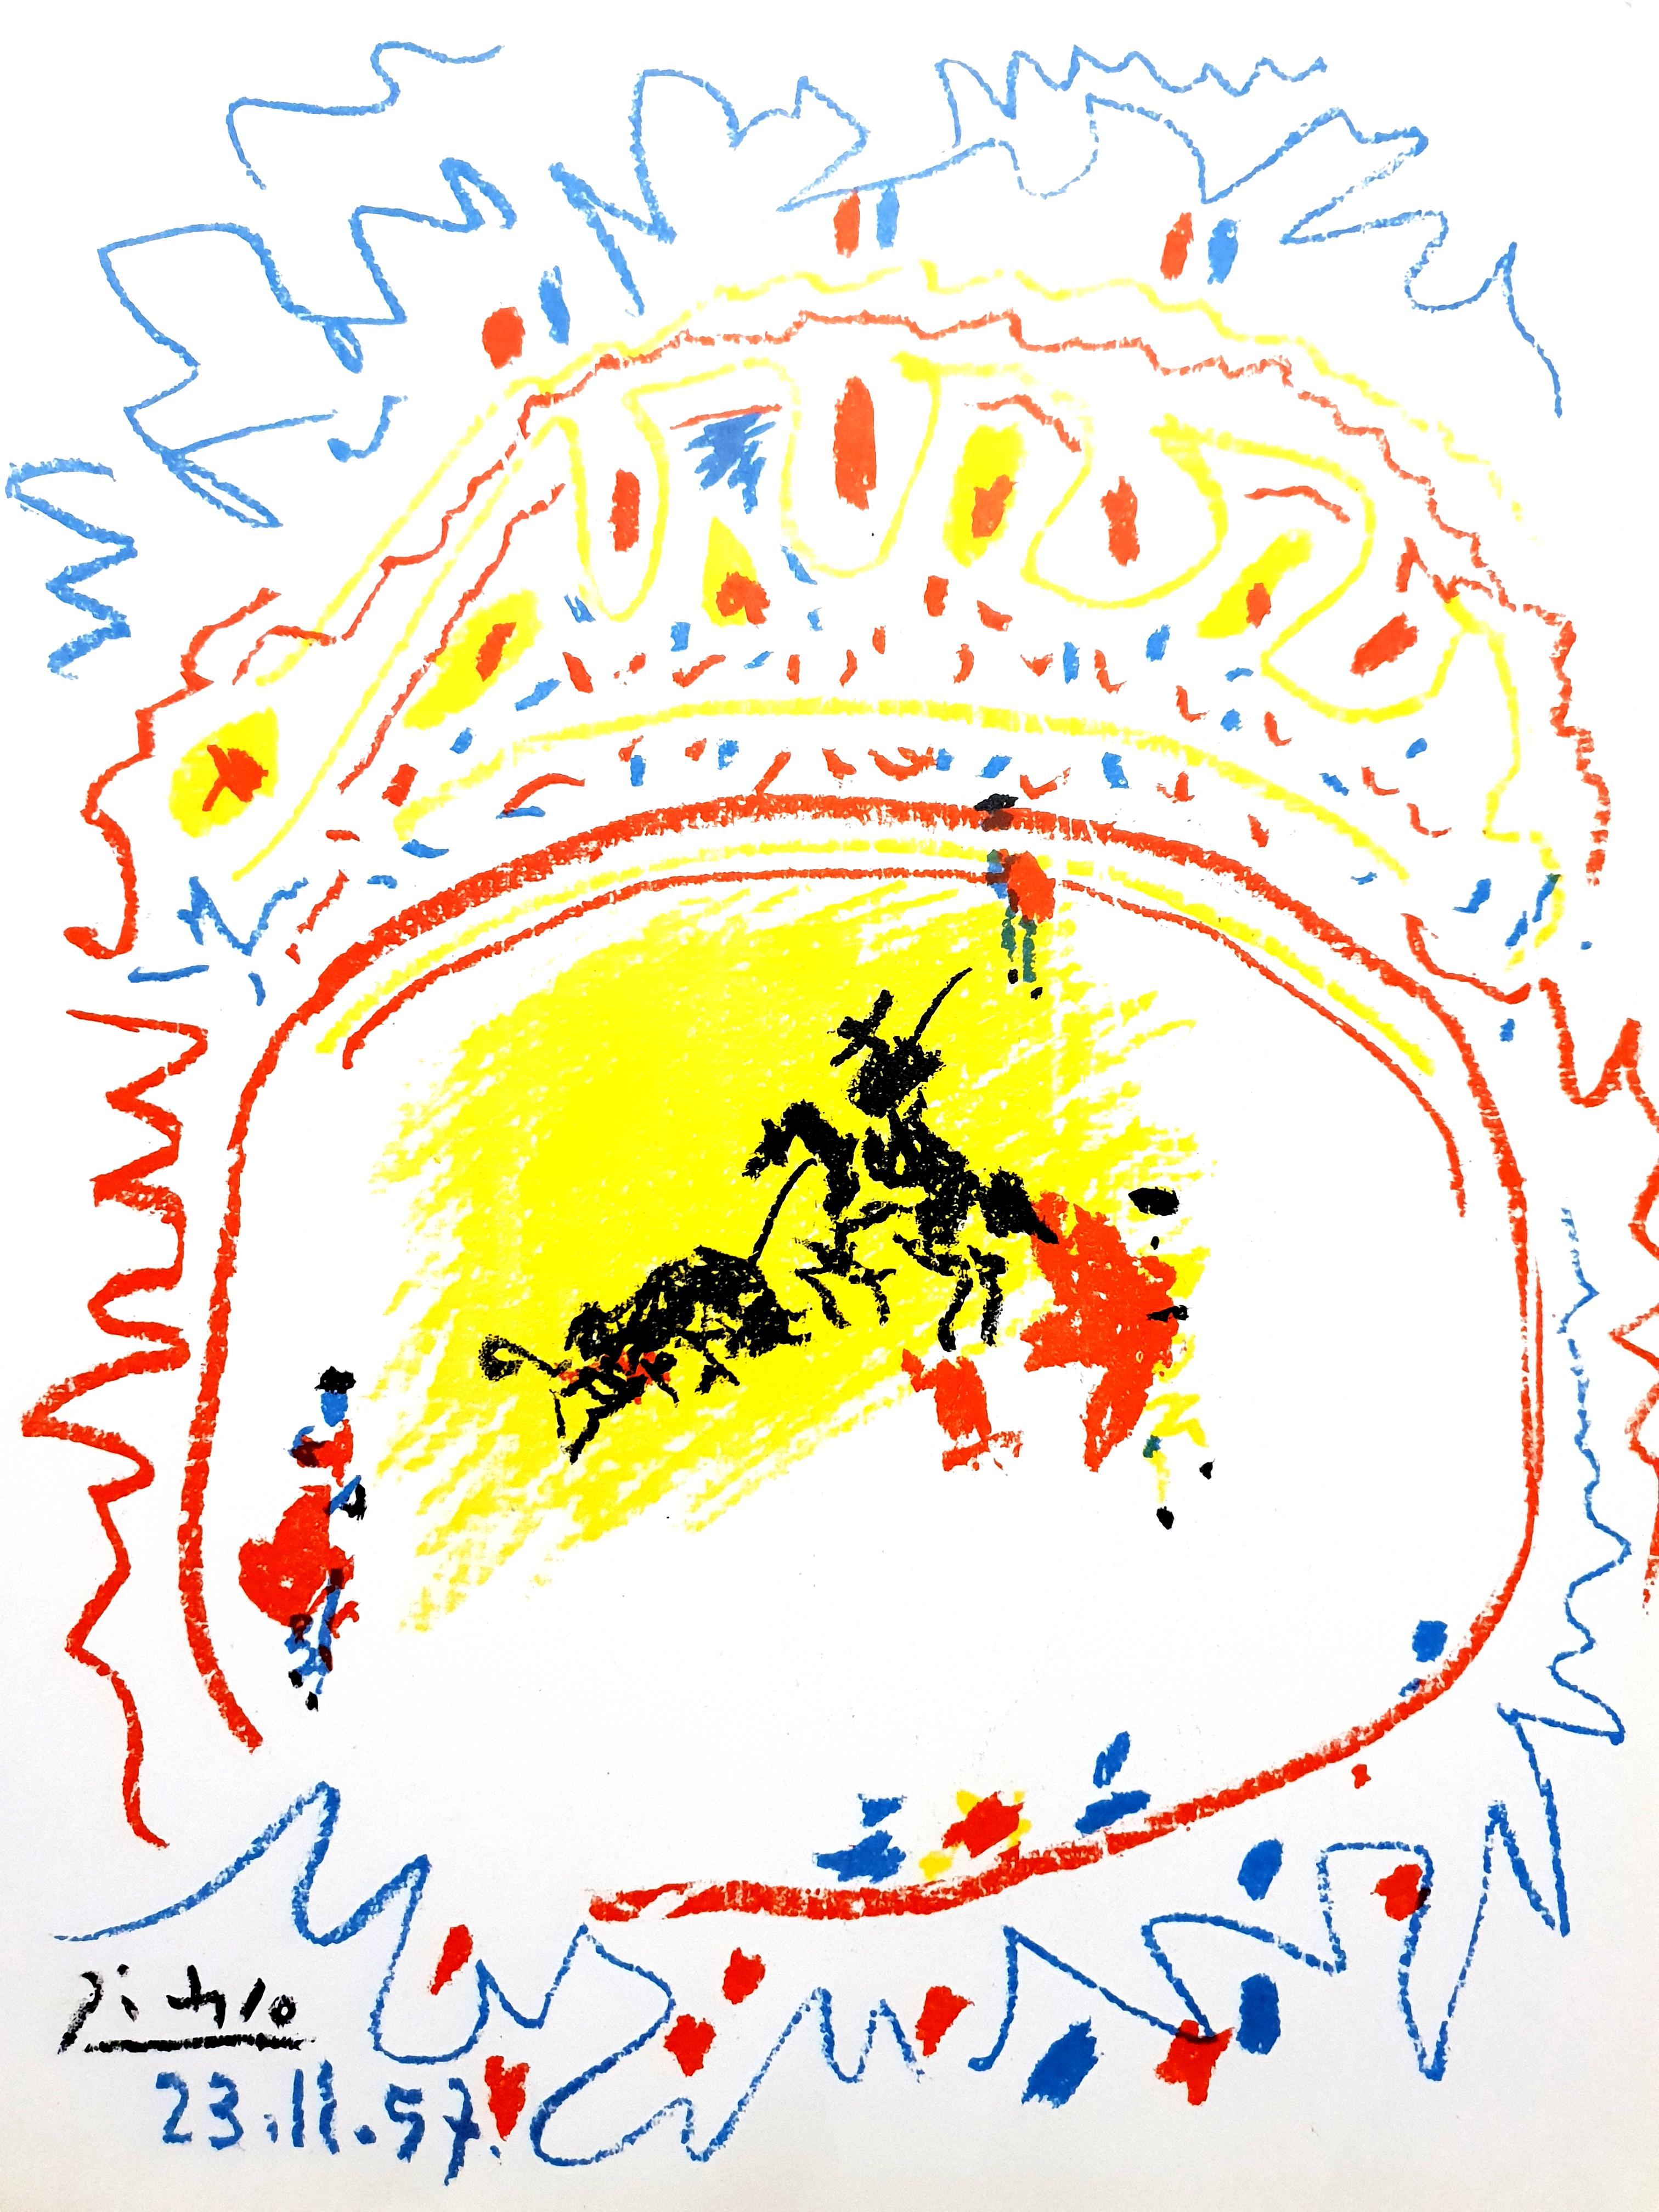 52e17fb047b Pablo Picasso - Pablo Picasso - Jeu de la Cape - Original Lithograph ...